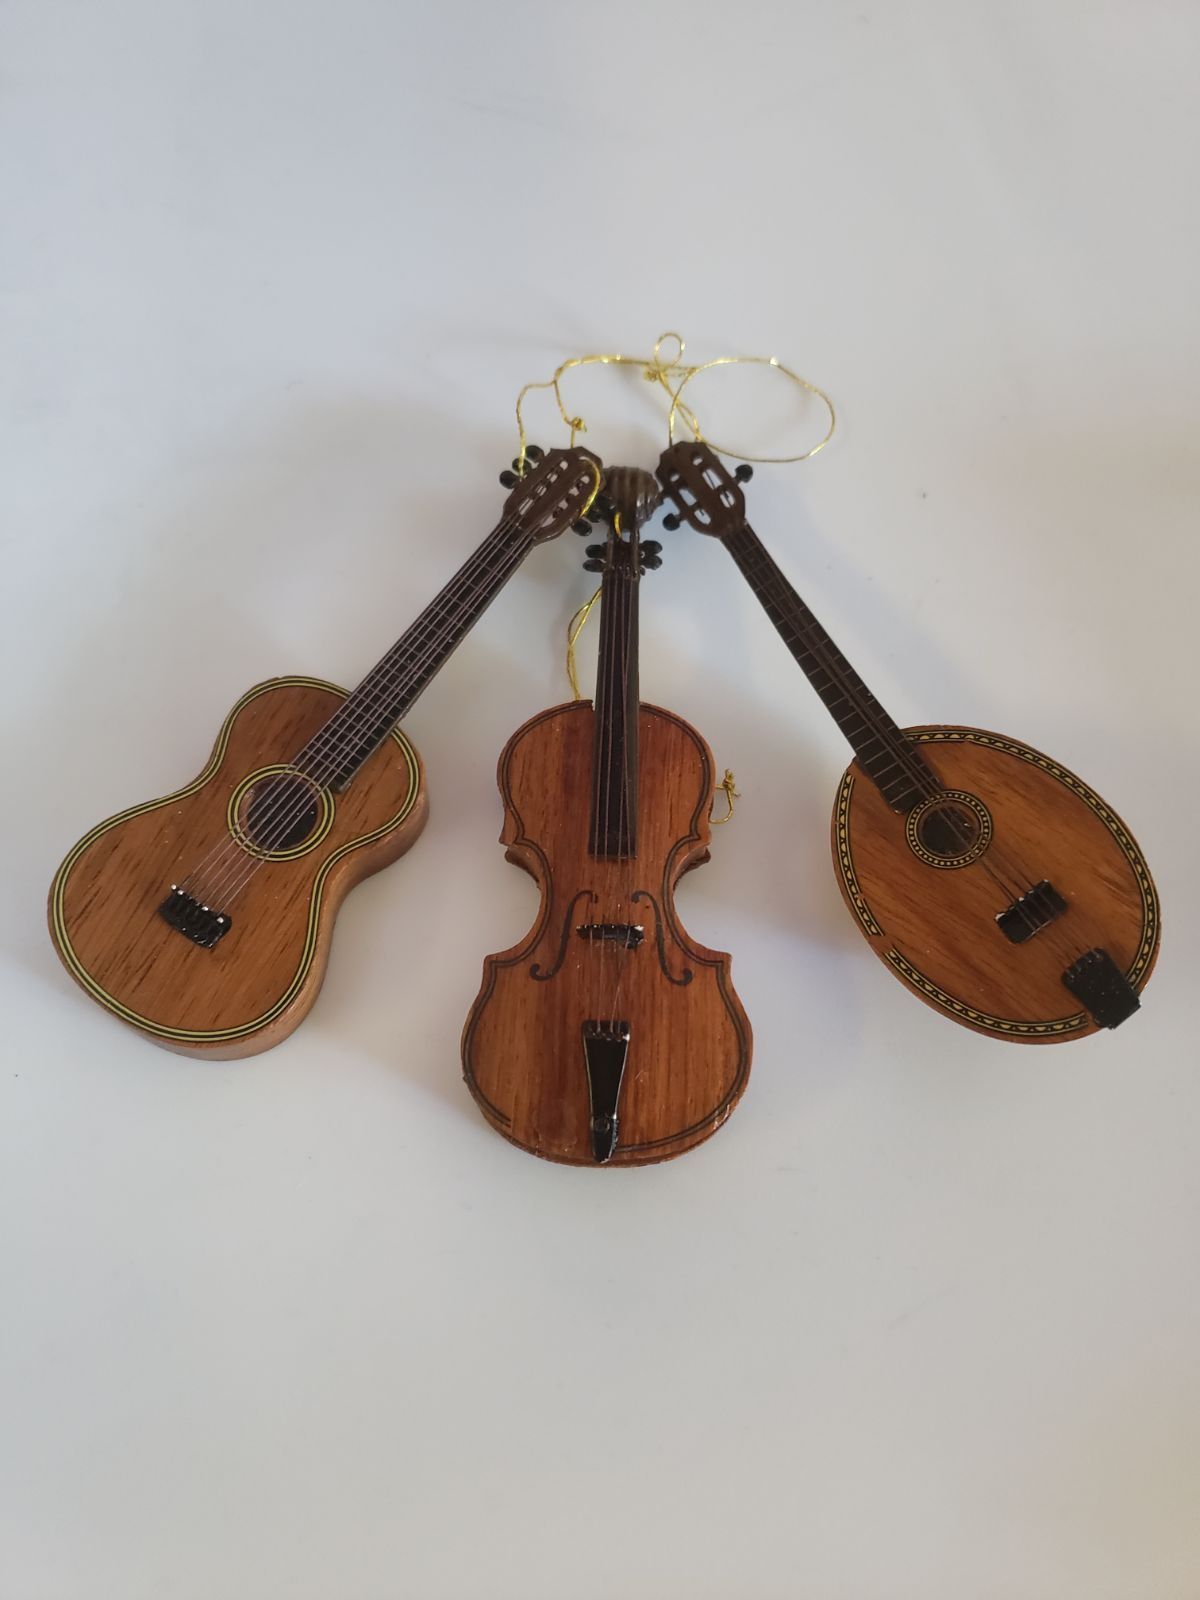 Instrumental ornaments